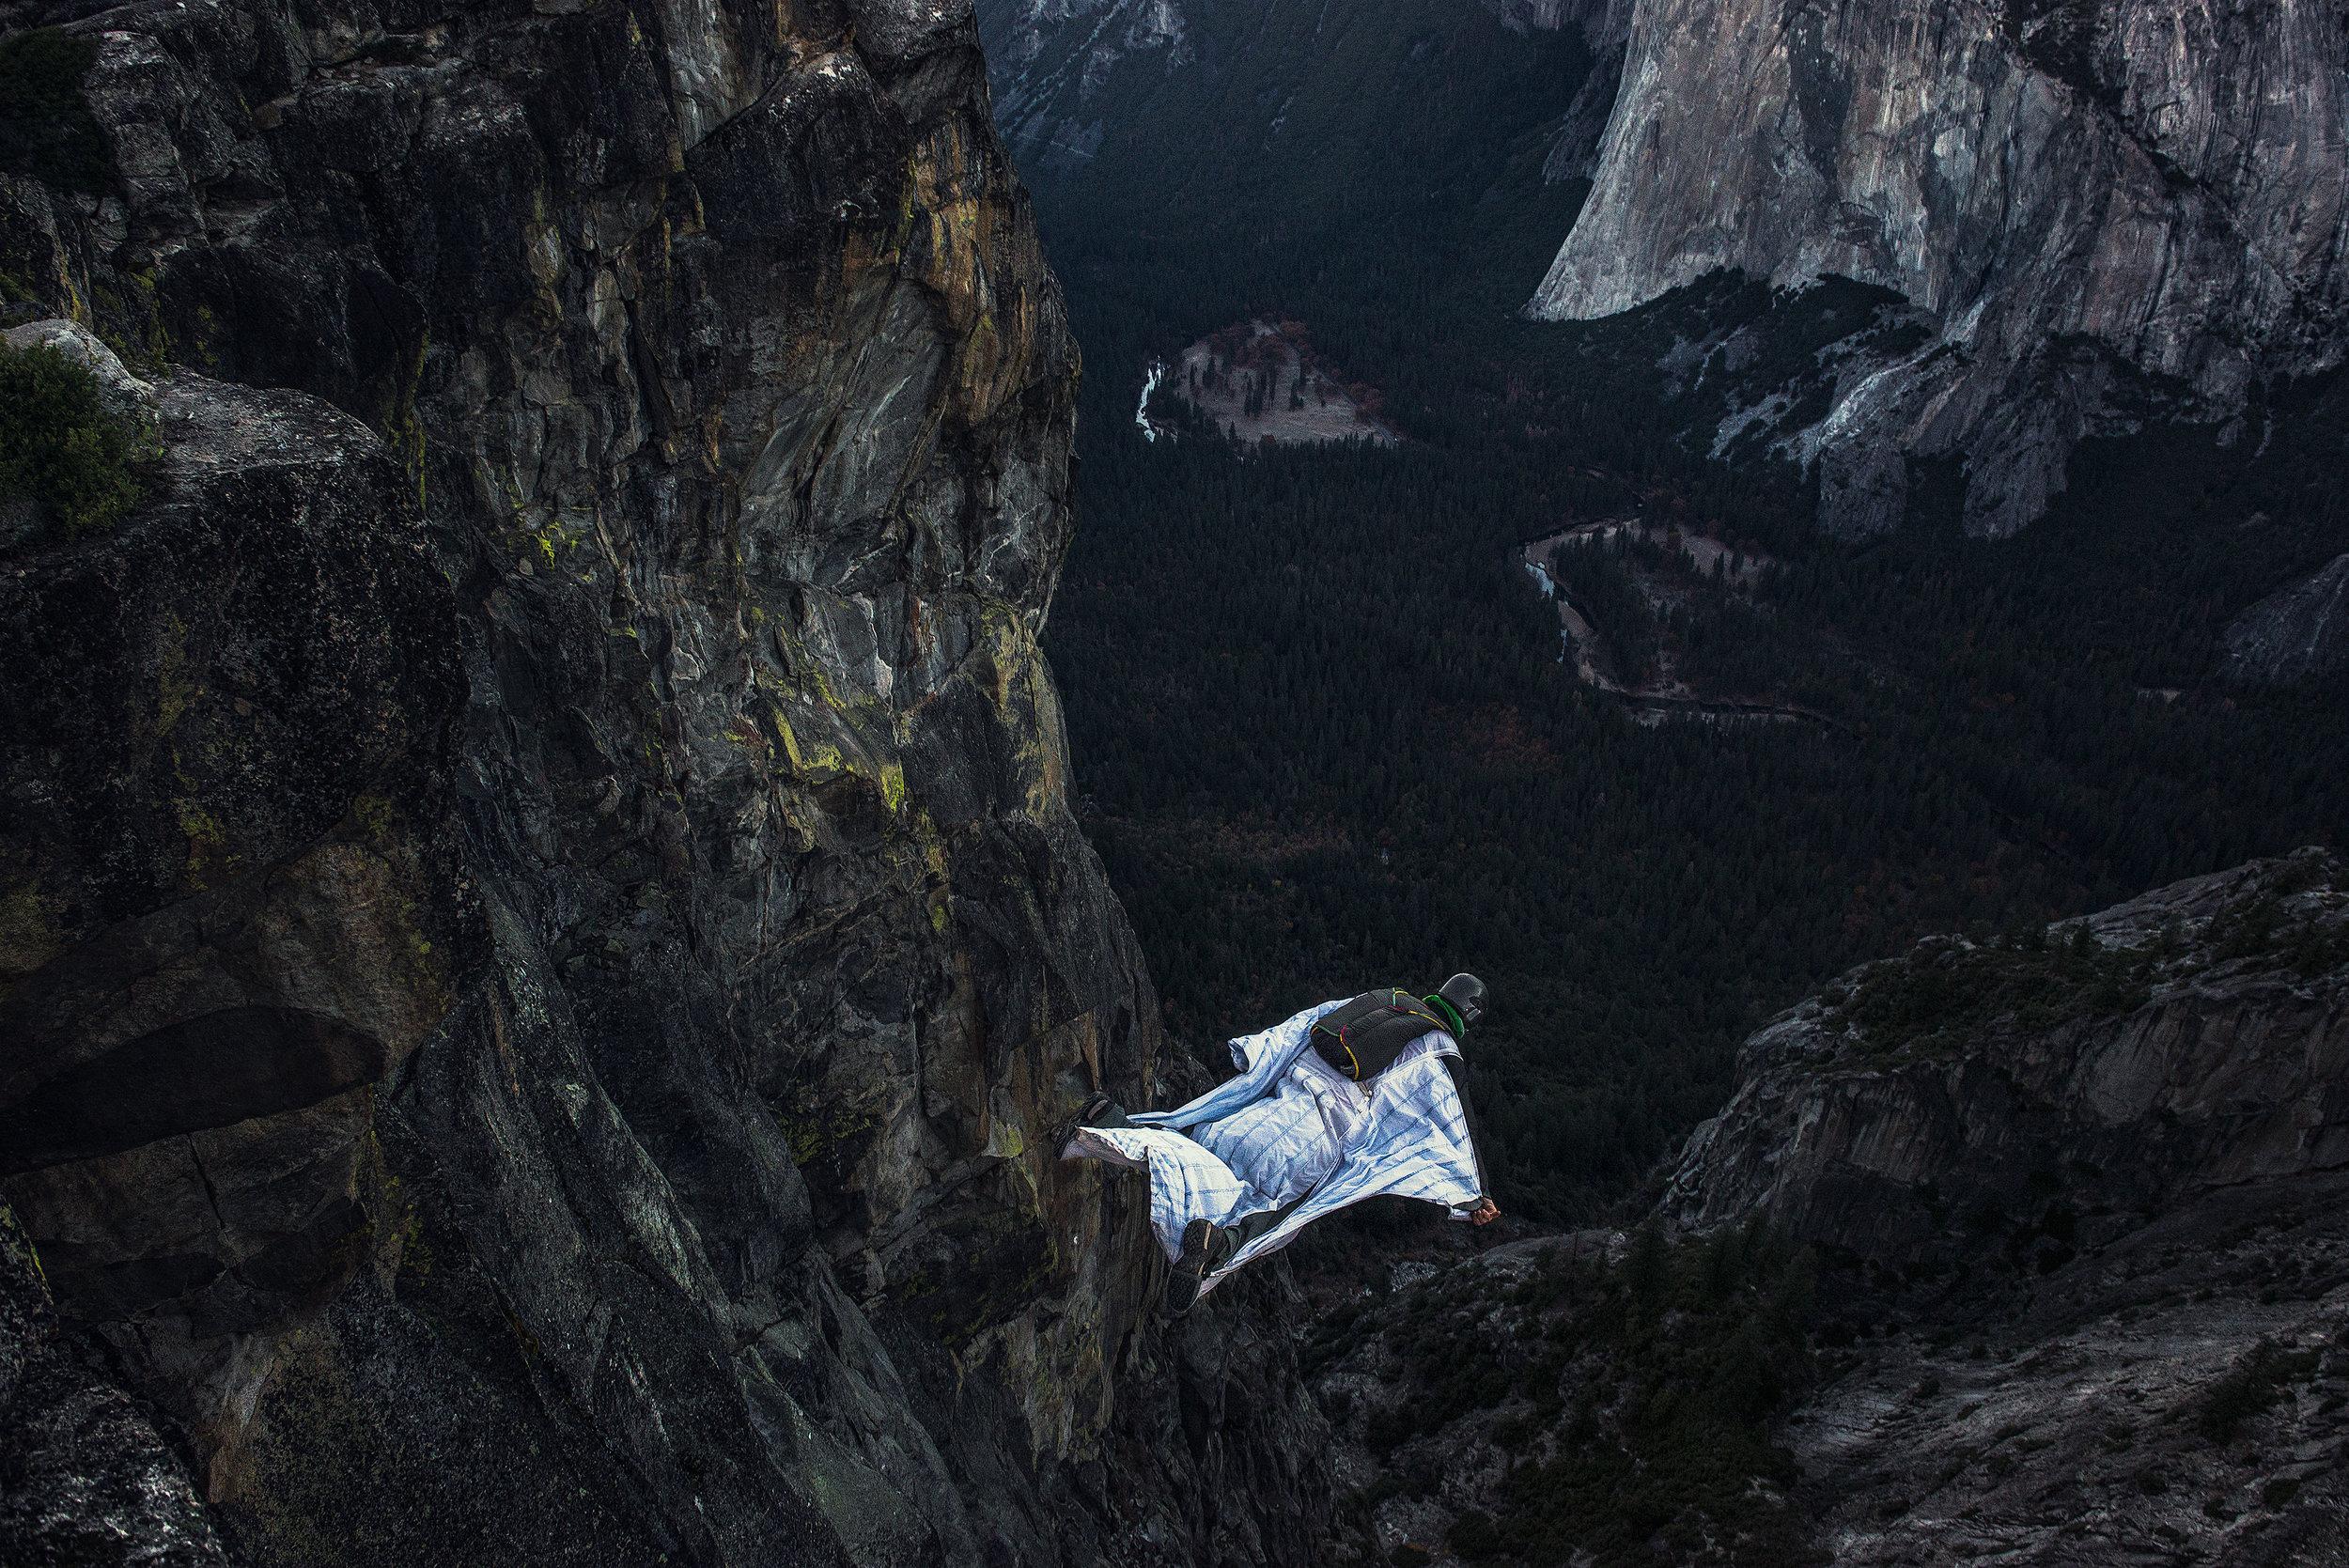 austin-trigg-wing-suit-base-jump-fly-yosemite-lifestyle-california-adventure-thrill-seeking-taft-point-valley.jpg